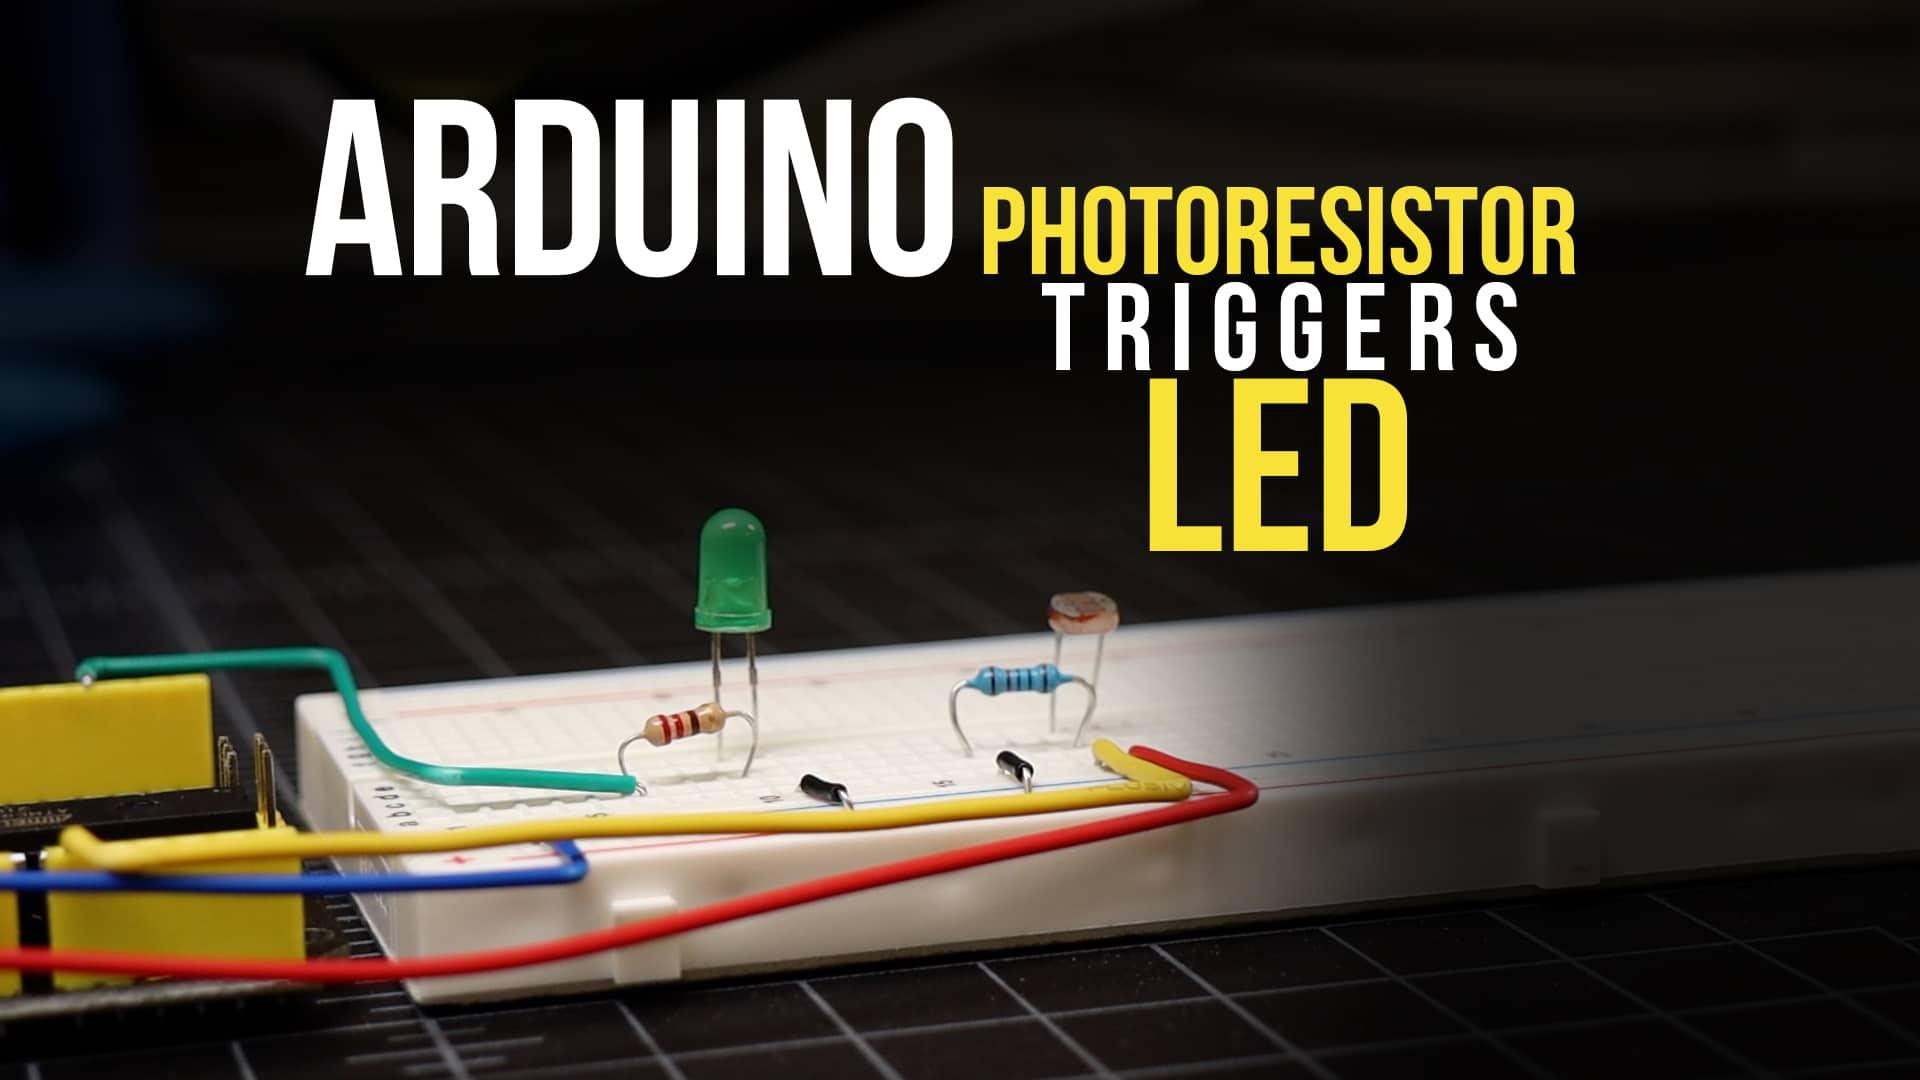 Light Sensor Trigger LED (photoresistor triggers LED)